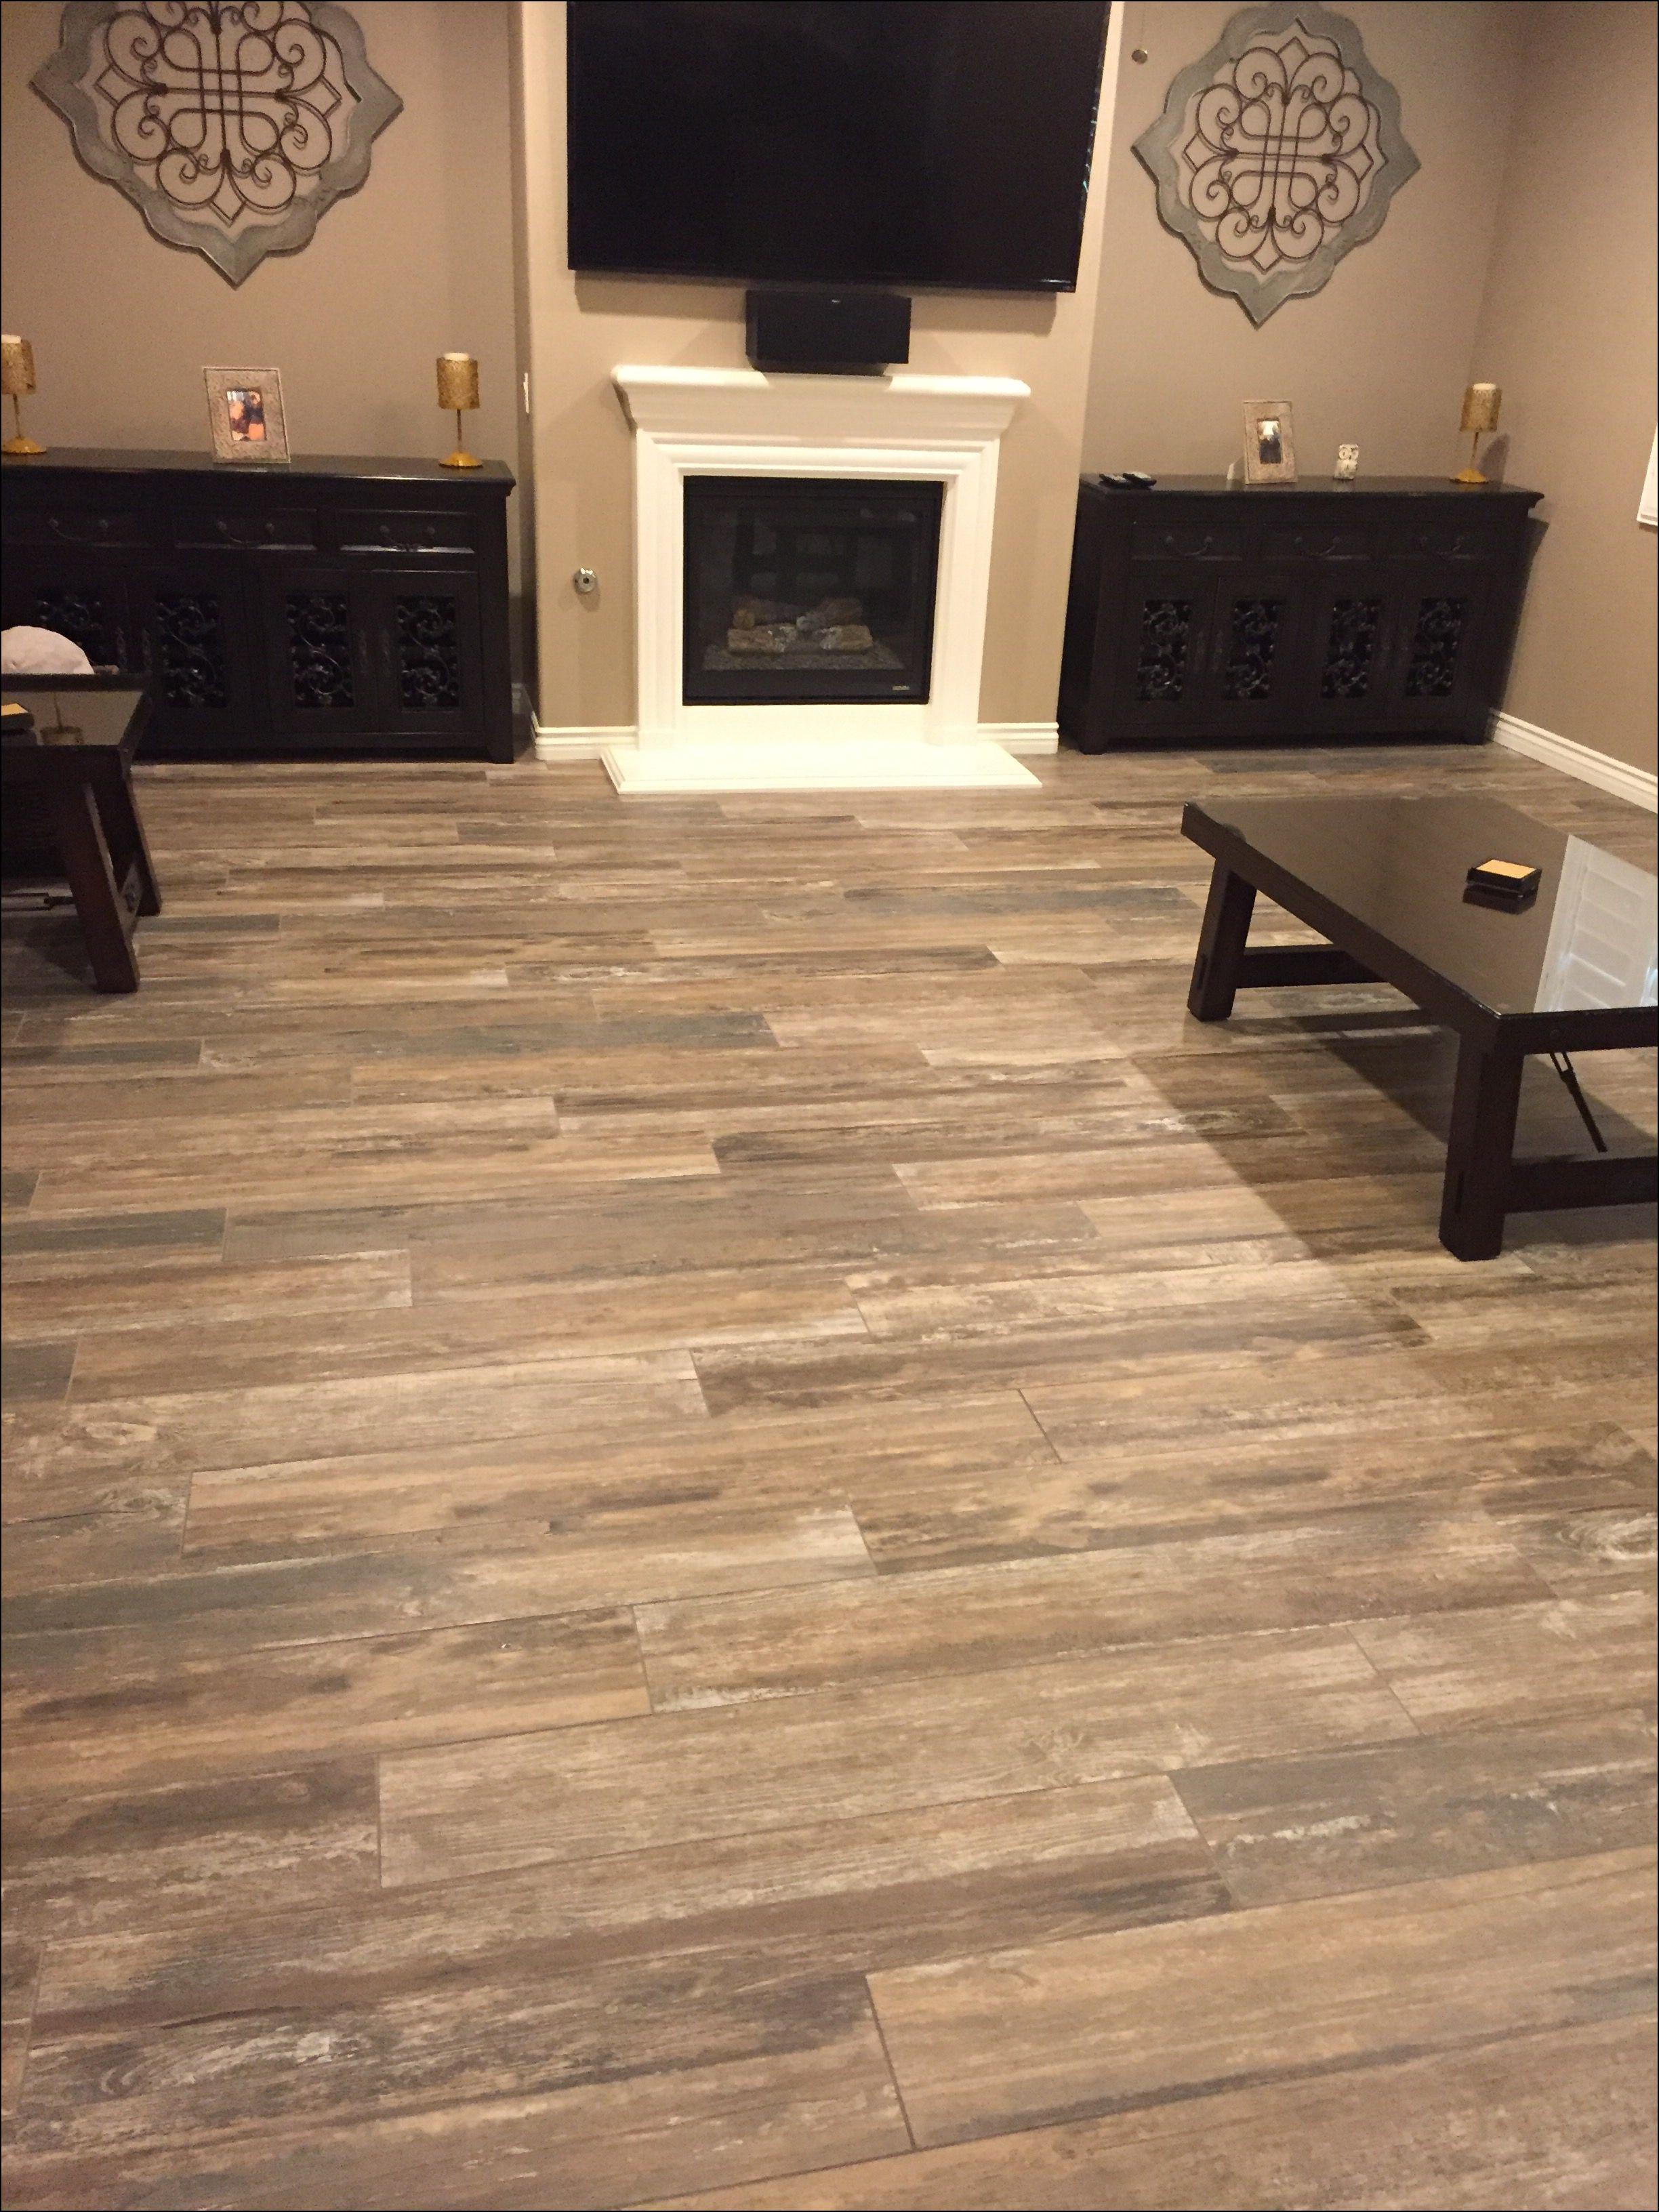 installing hardwood floors youtube of hardwood flooring suppliers france flooring ideas in hardwood flooring installation san diego stock cork flooring in an historic southern inn of hardwood flooring